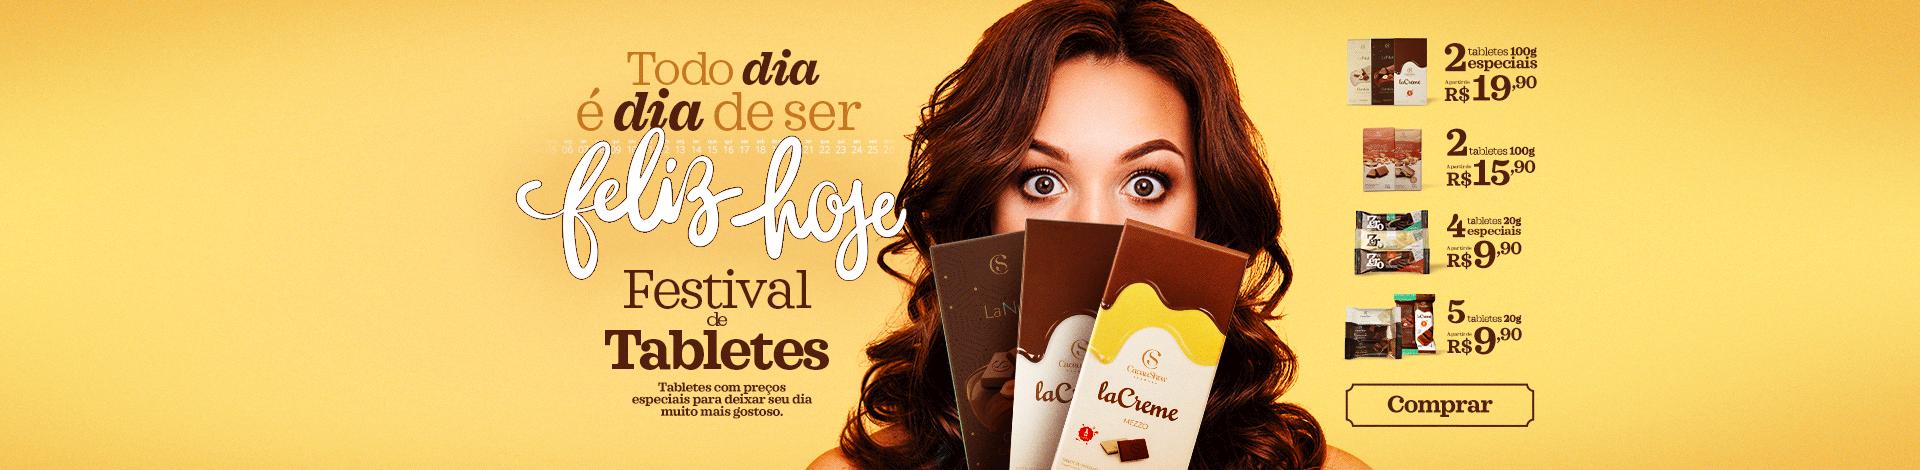 Festival de tabletes